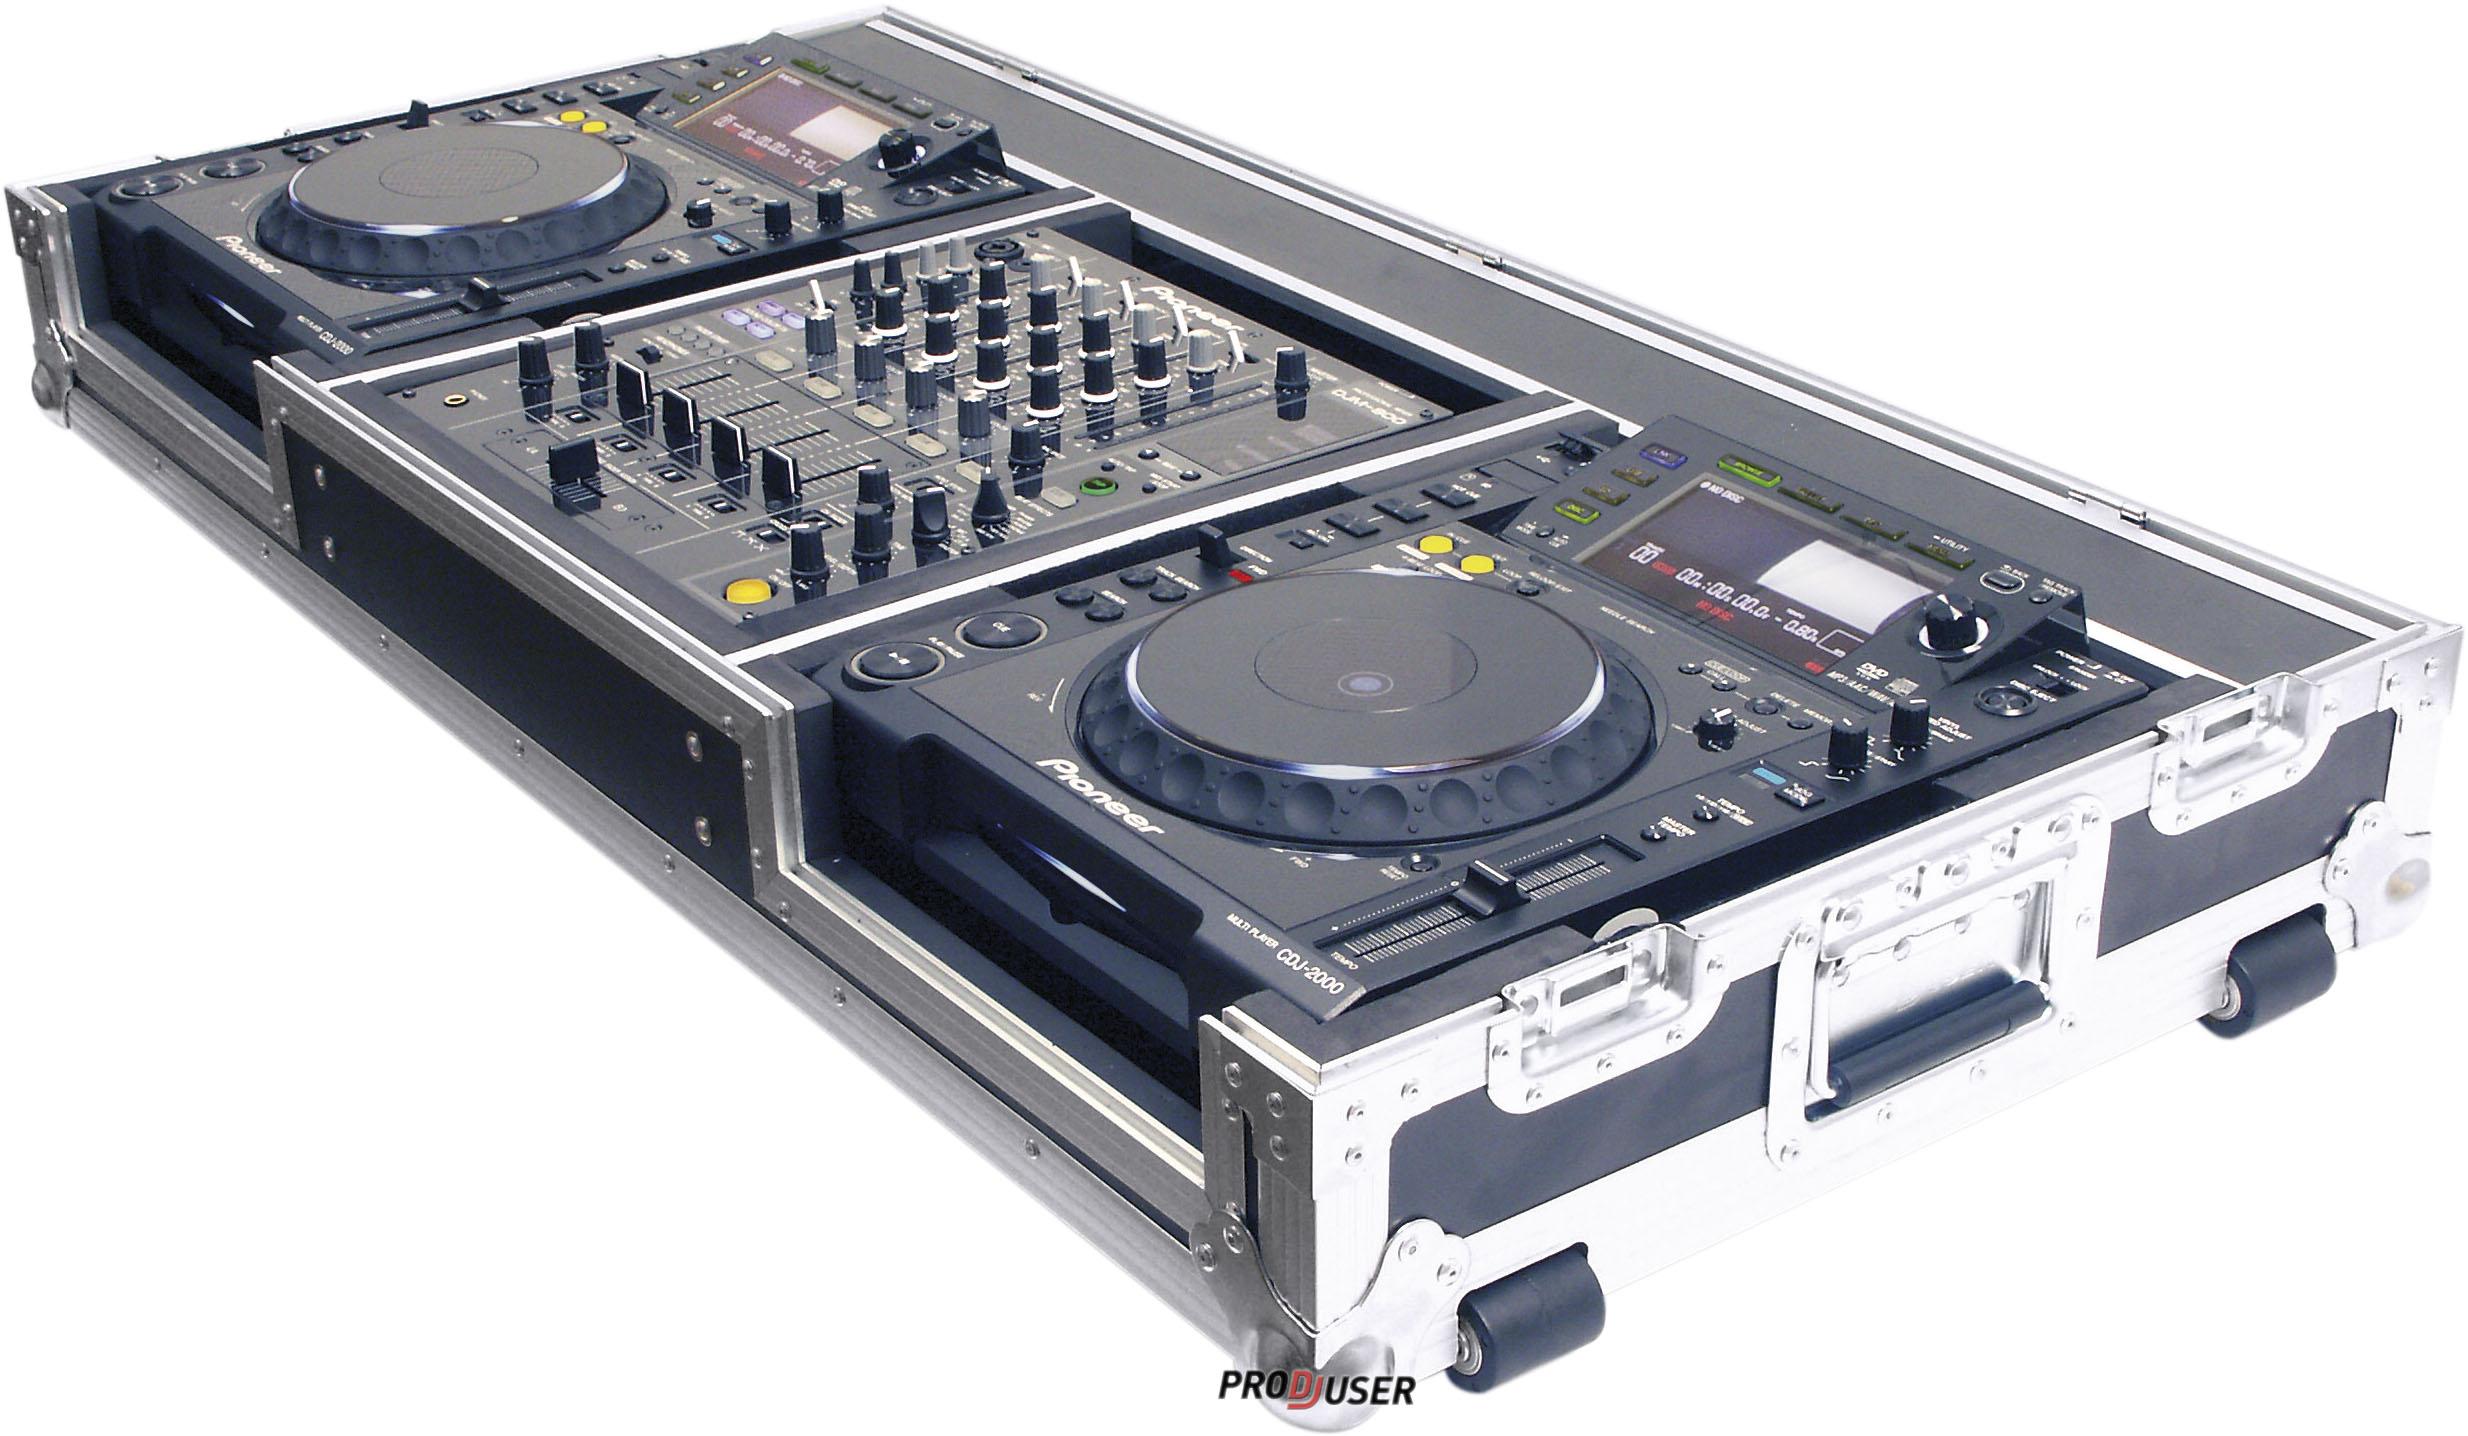 2 x CDJ-850 + DJM-750 + Flightcase